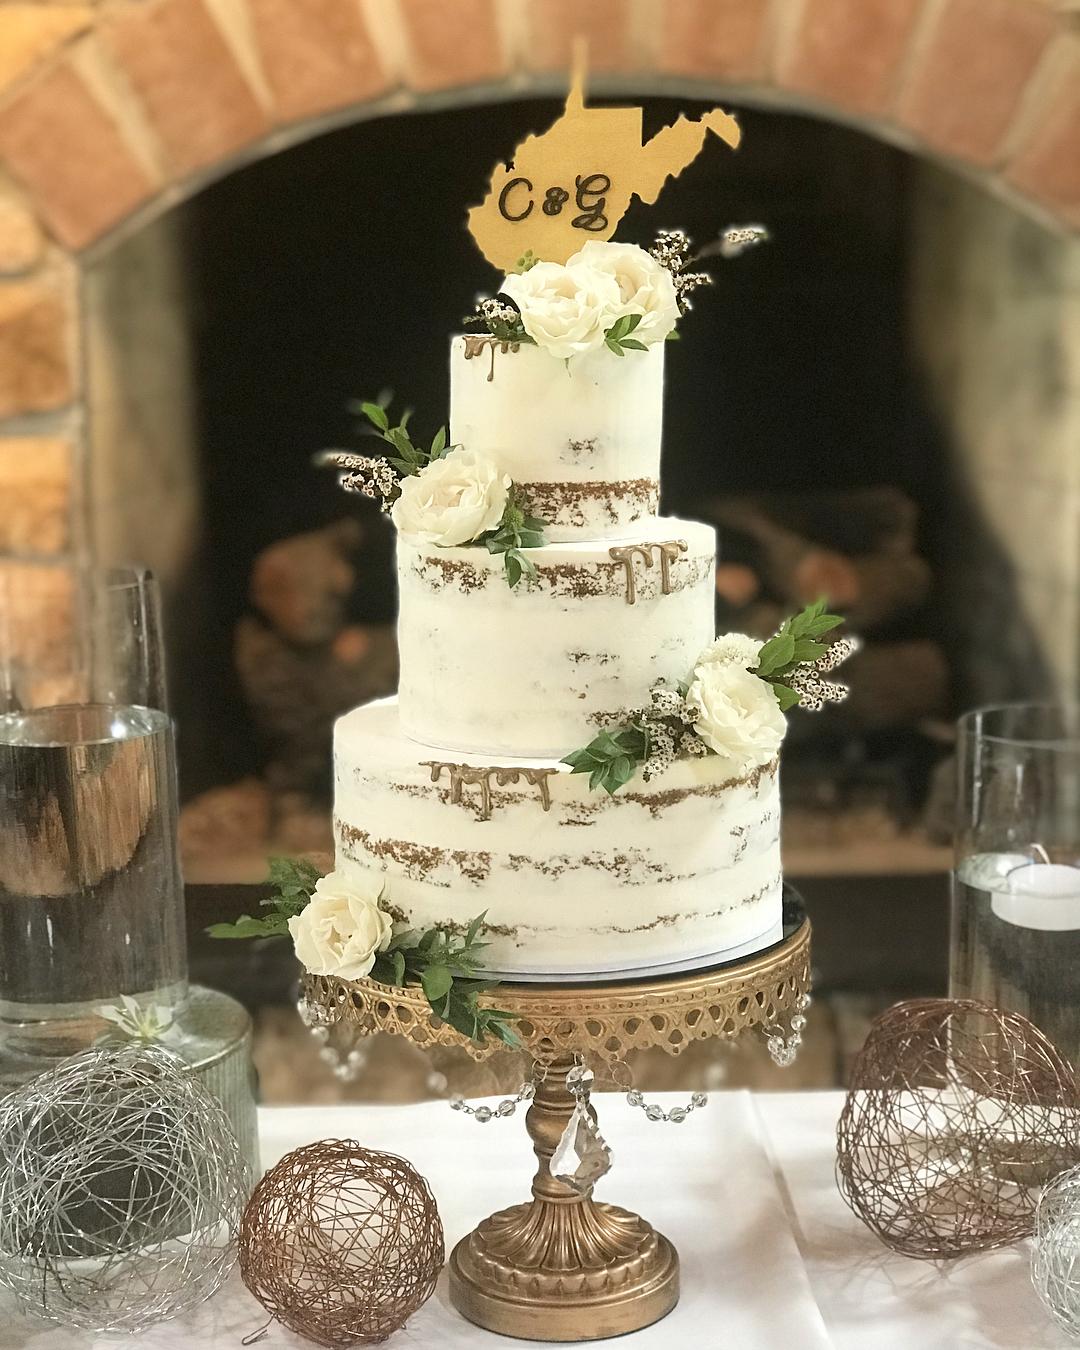 couturecakery wedding cake cakestand by opulent treasures.jpg